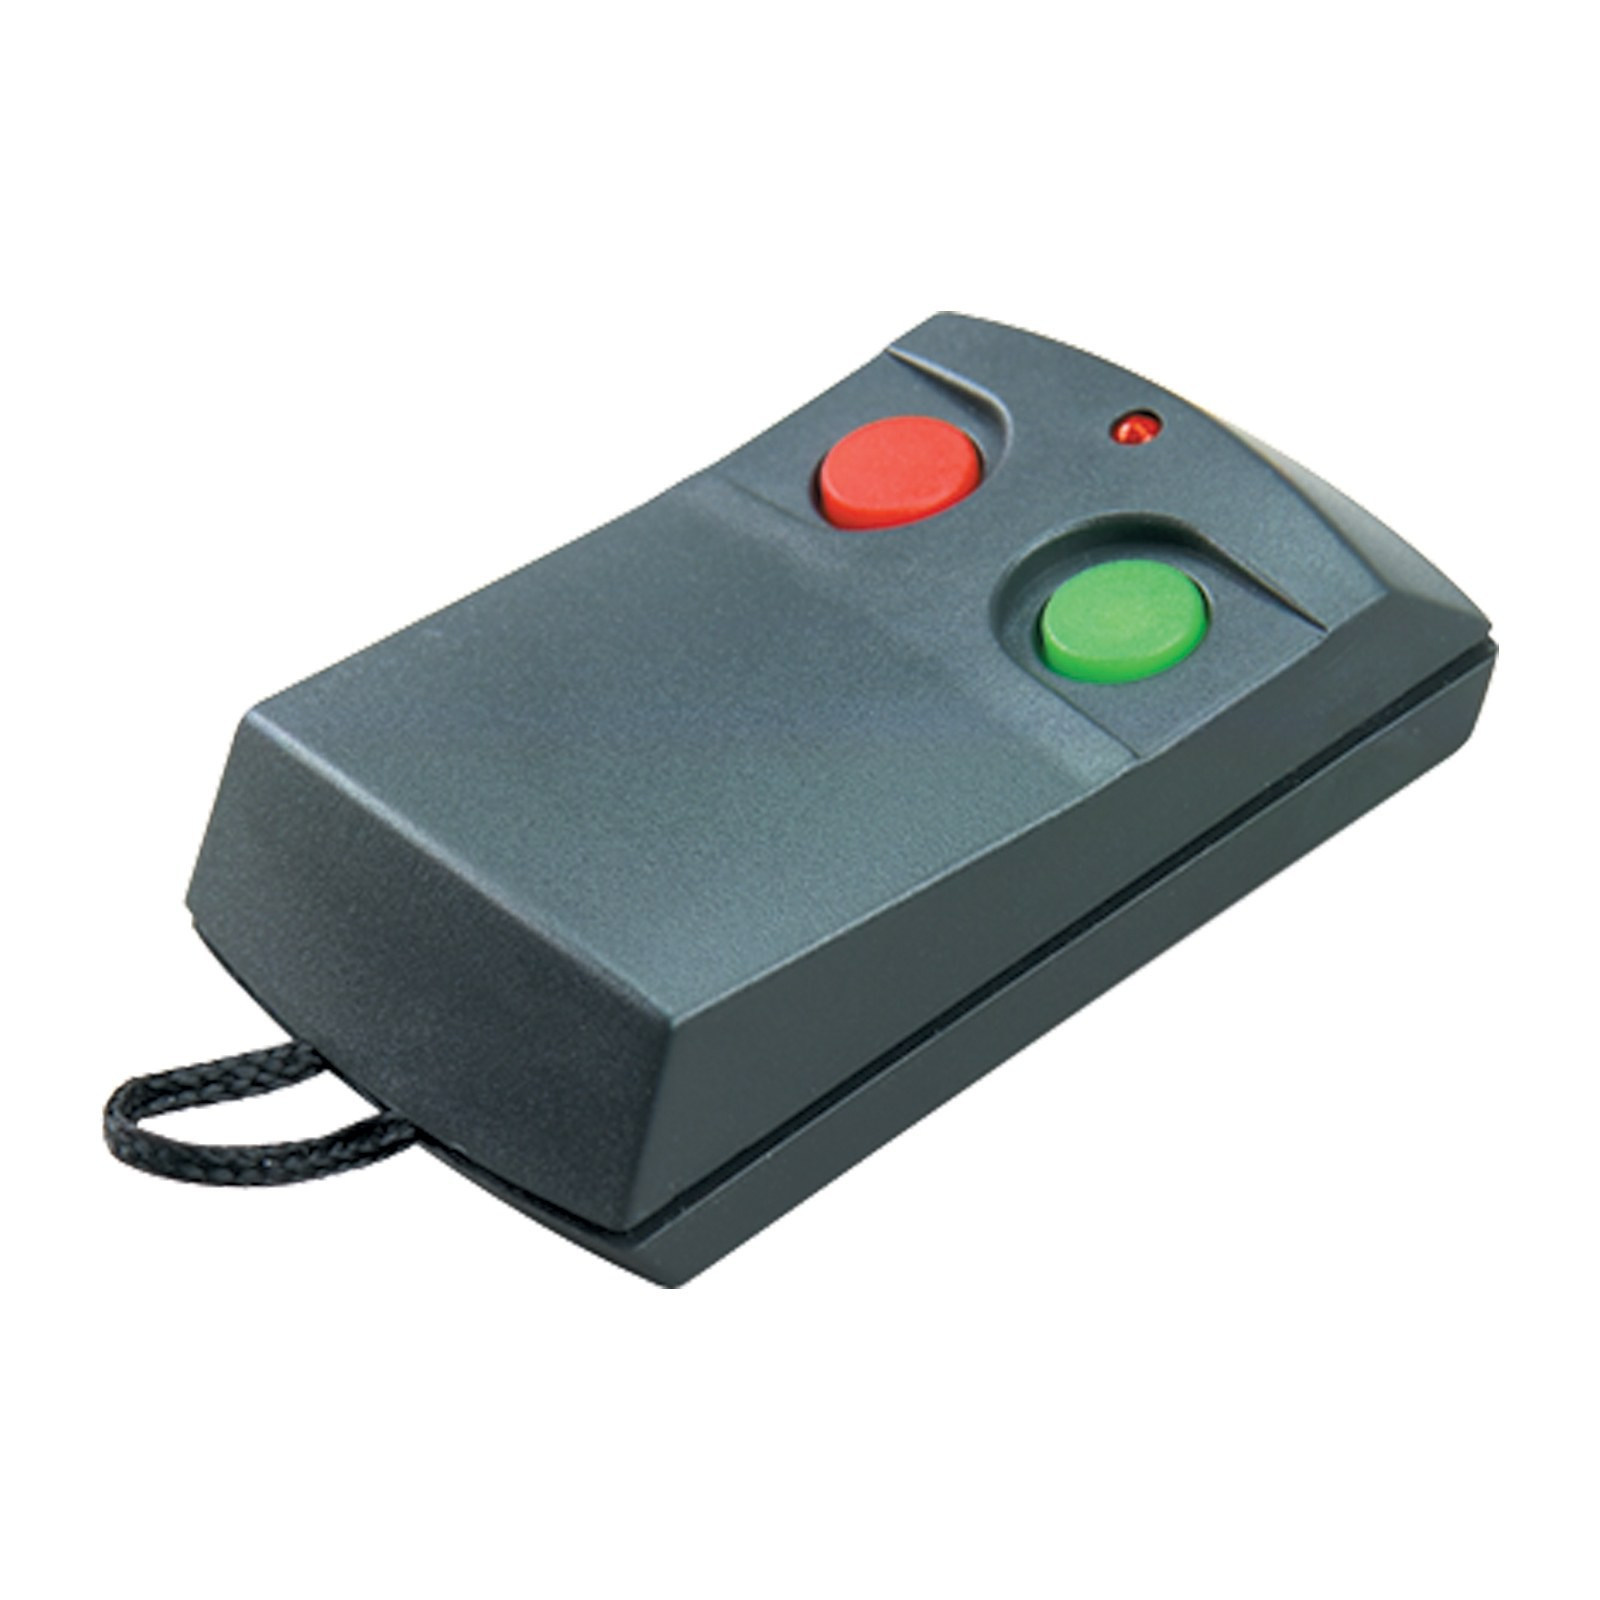 Antifurto allarme casa kit wireless senza fili hiltron kd5007 sirena sensori pir vultech life - Allarme per casa senza fili ...